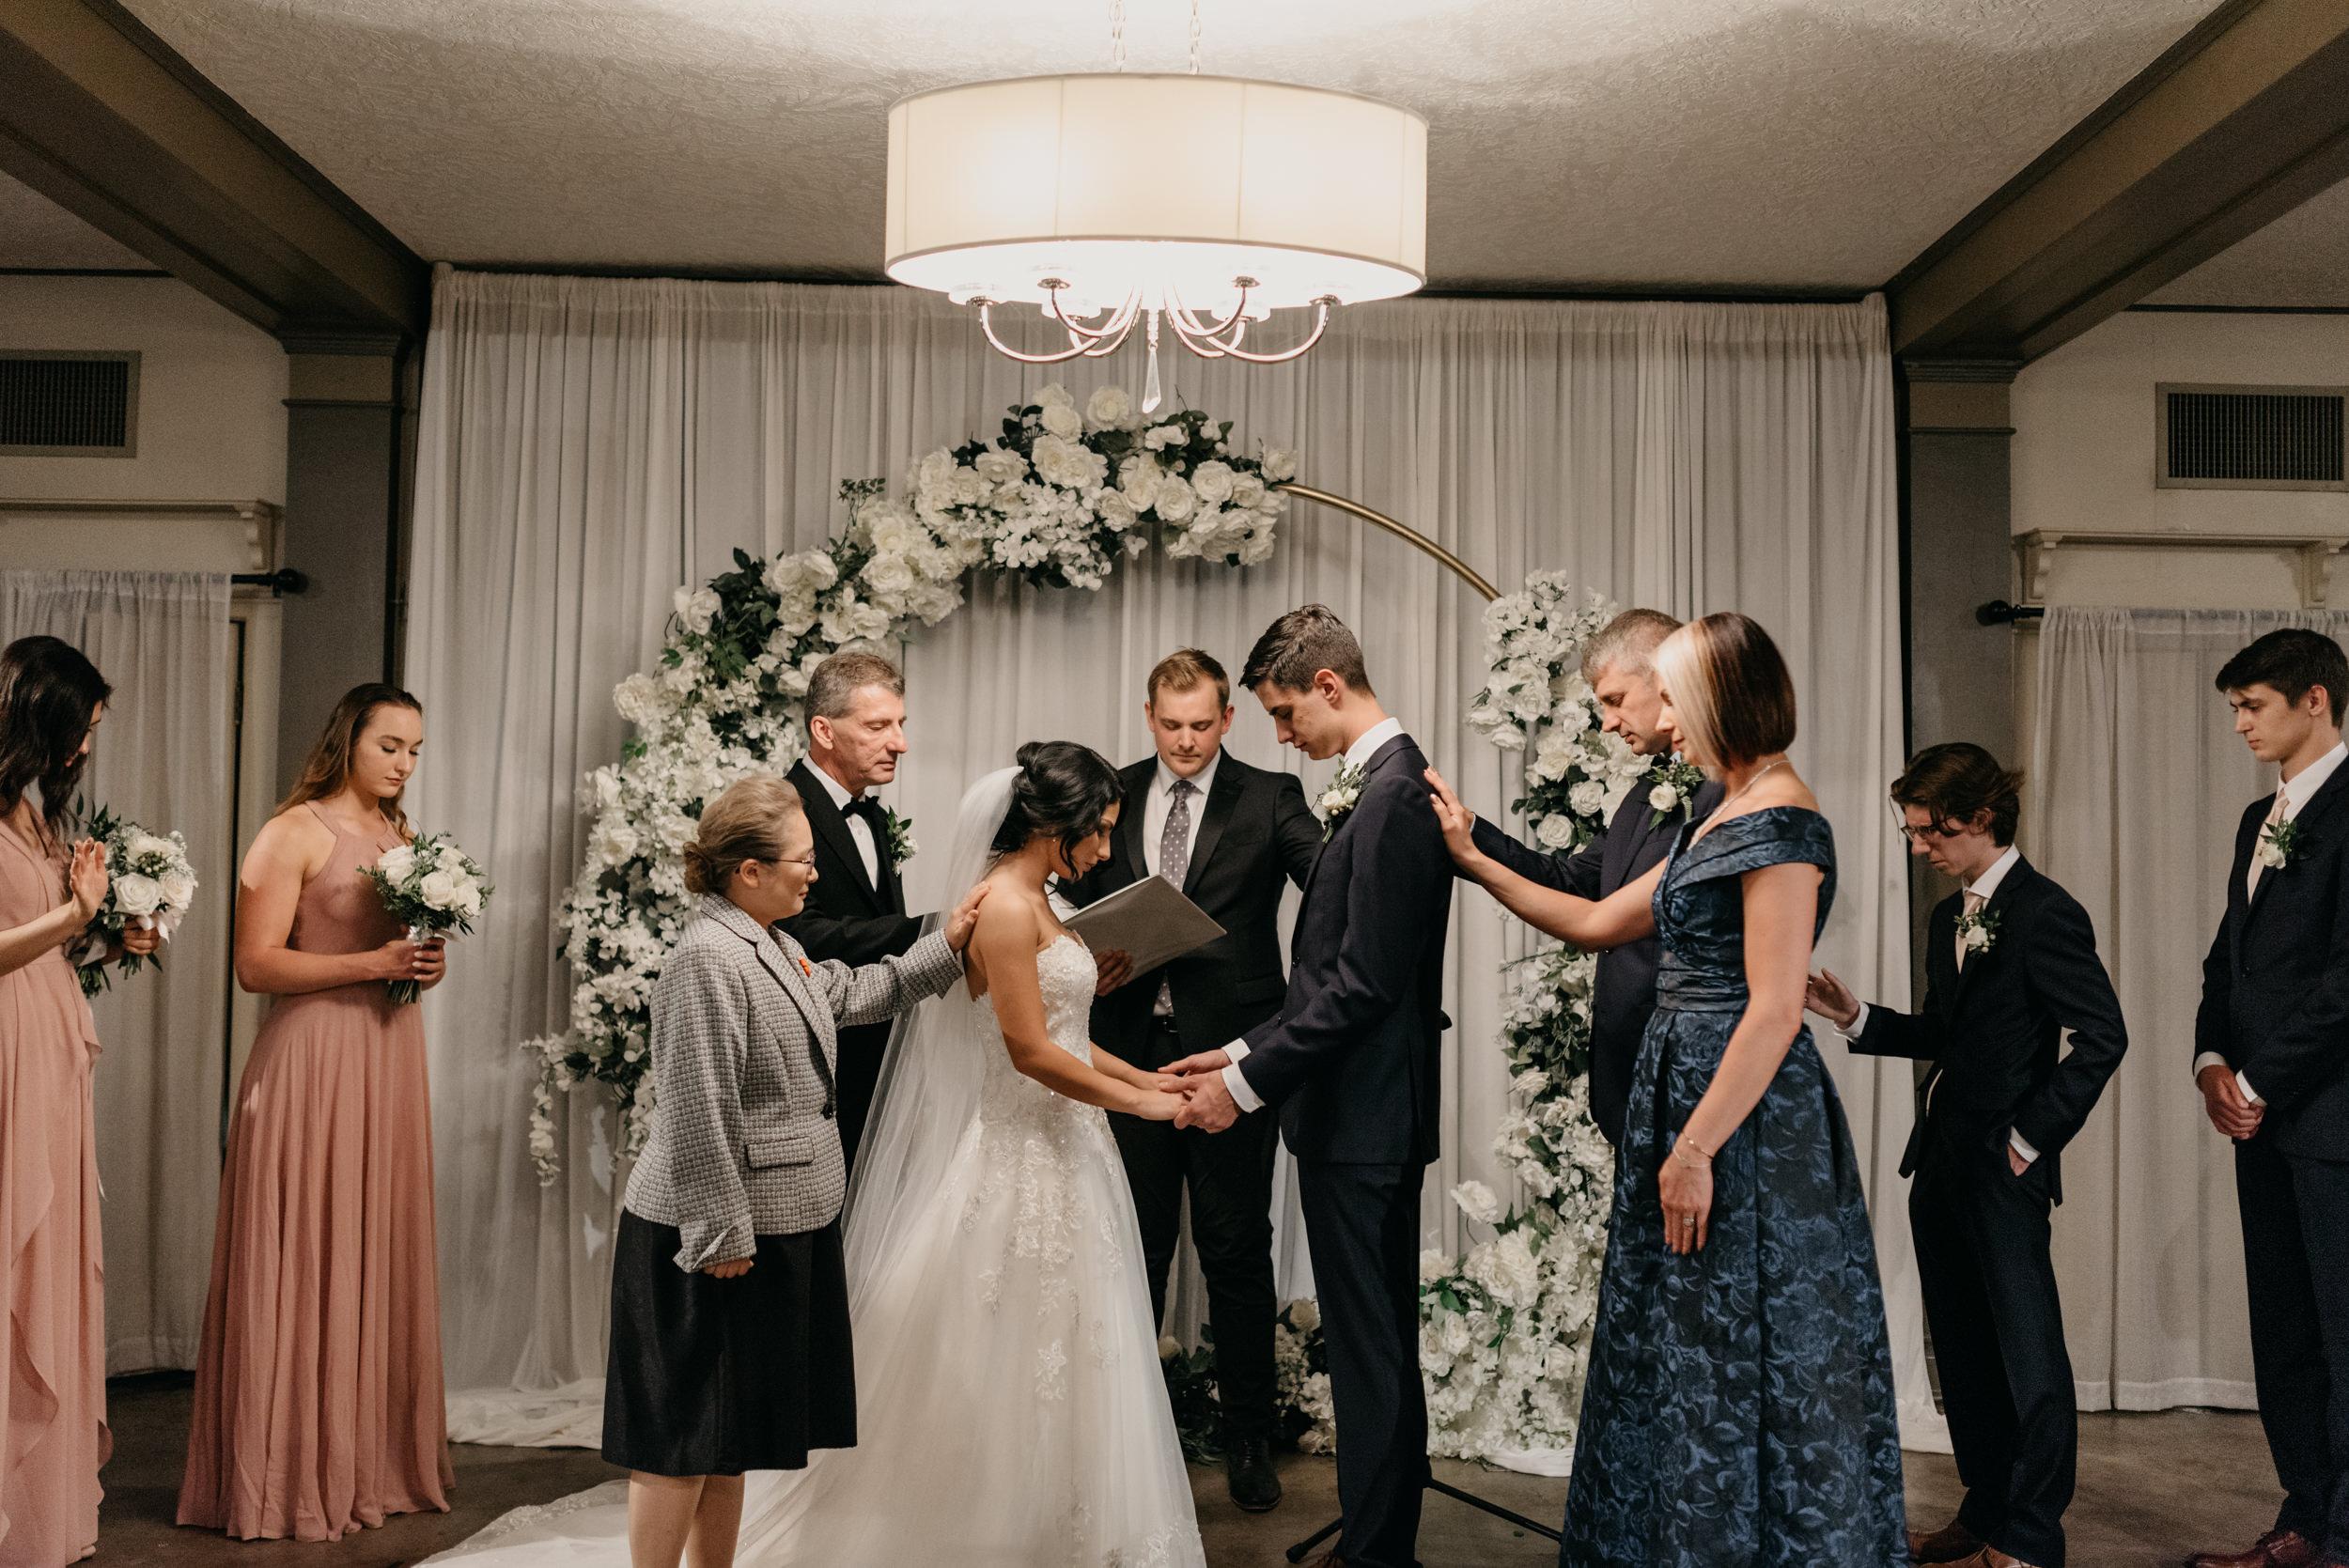 85-ceremony-west-end-ballroom-portland-wedding-venue-7974.jpg